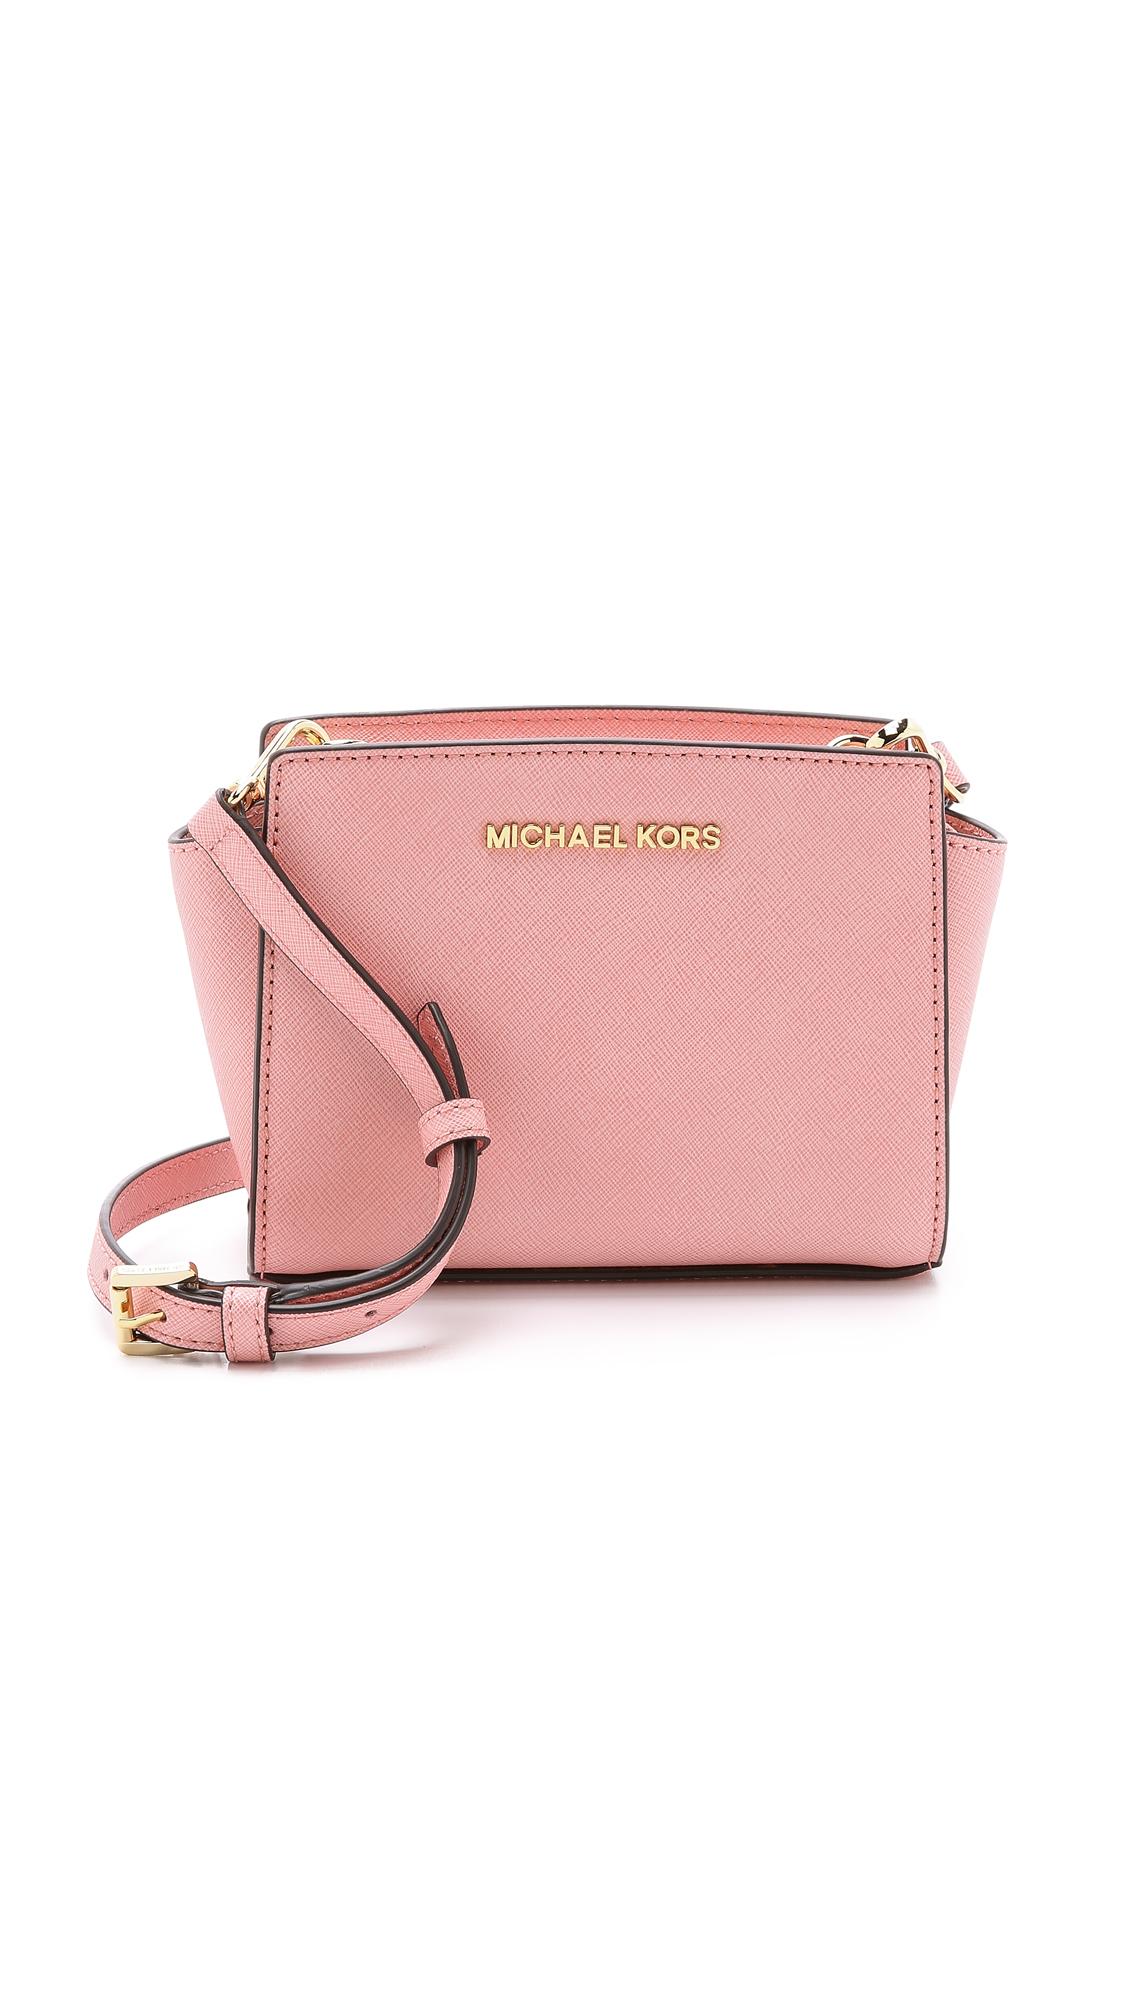 ... low cost lyst michael kors selma mini messenger bag pale pink in 599f2  b7479 af4f88c7517ef